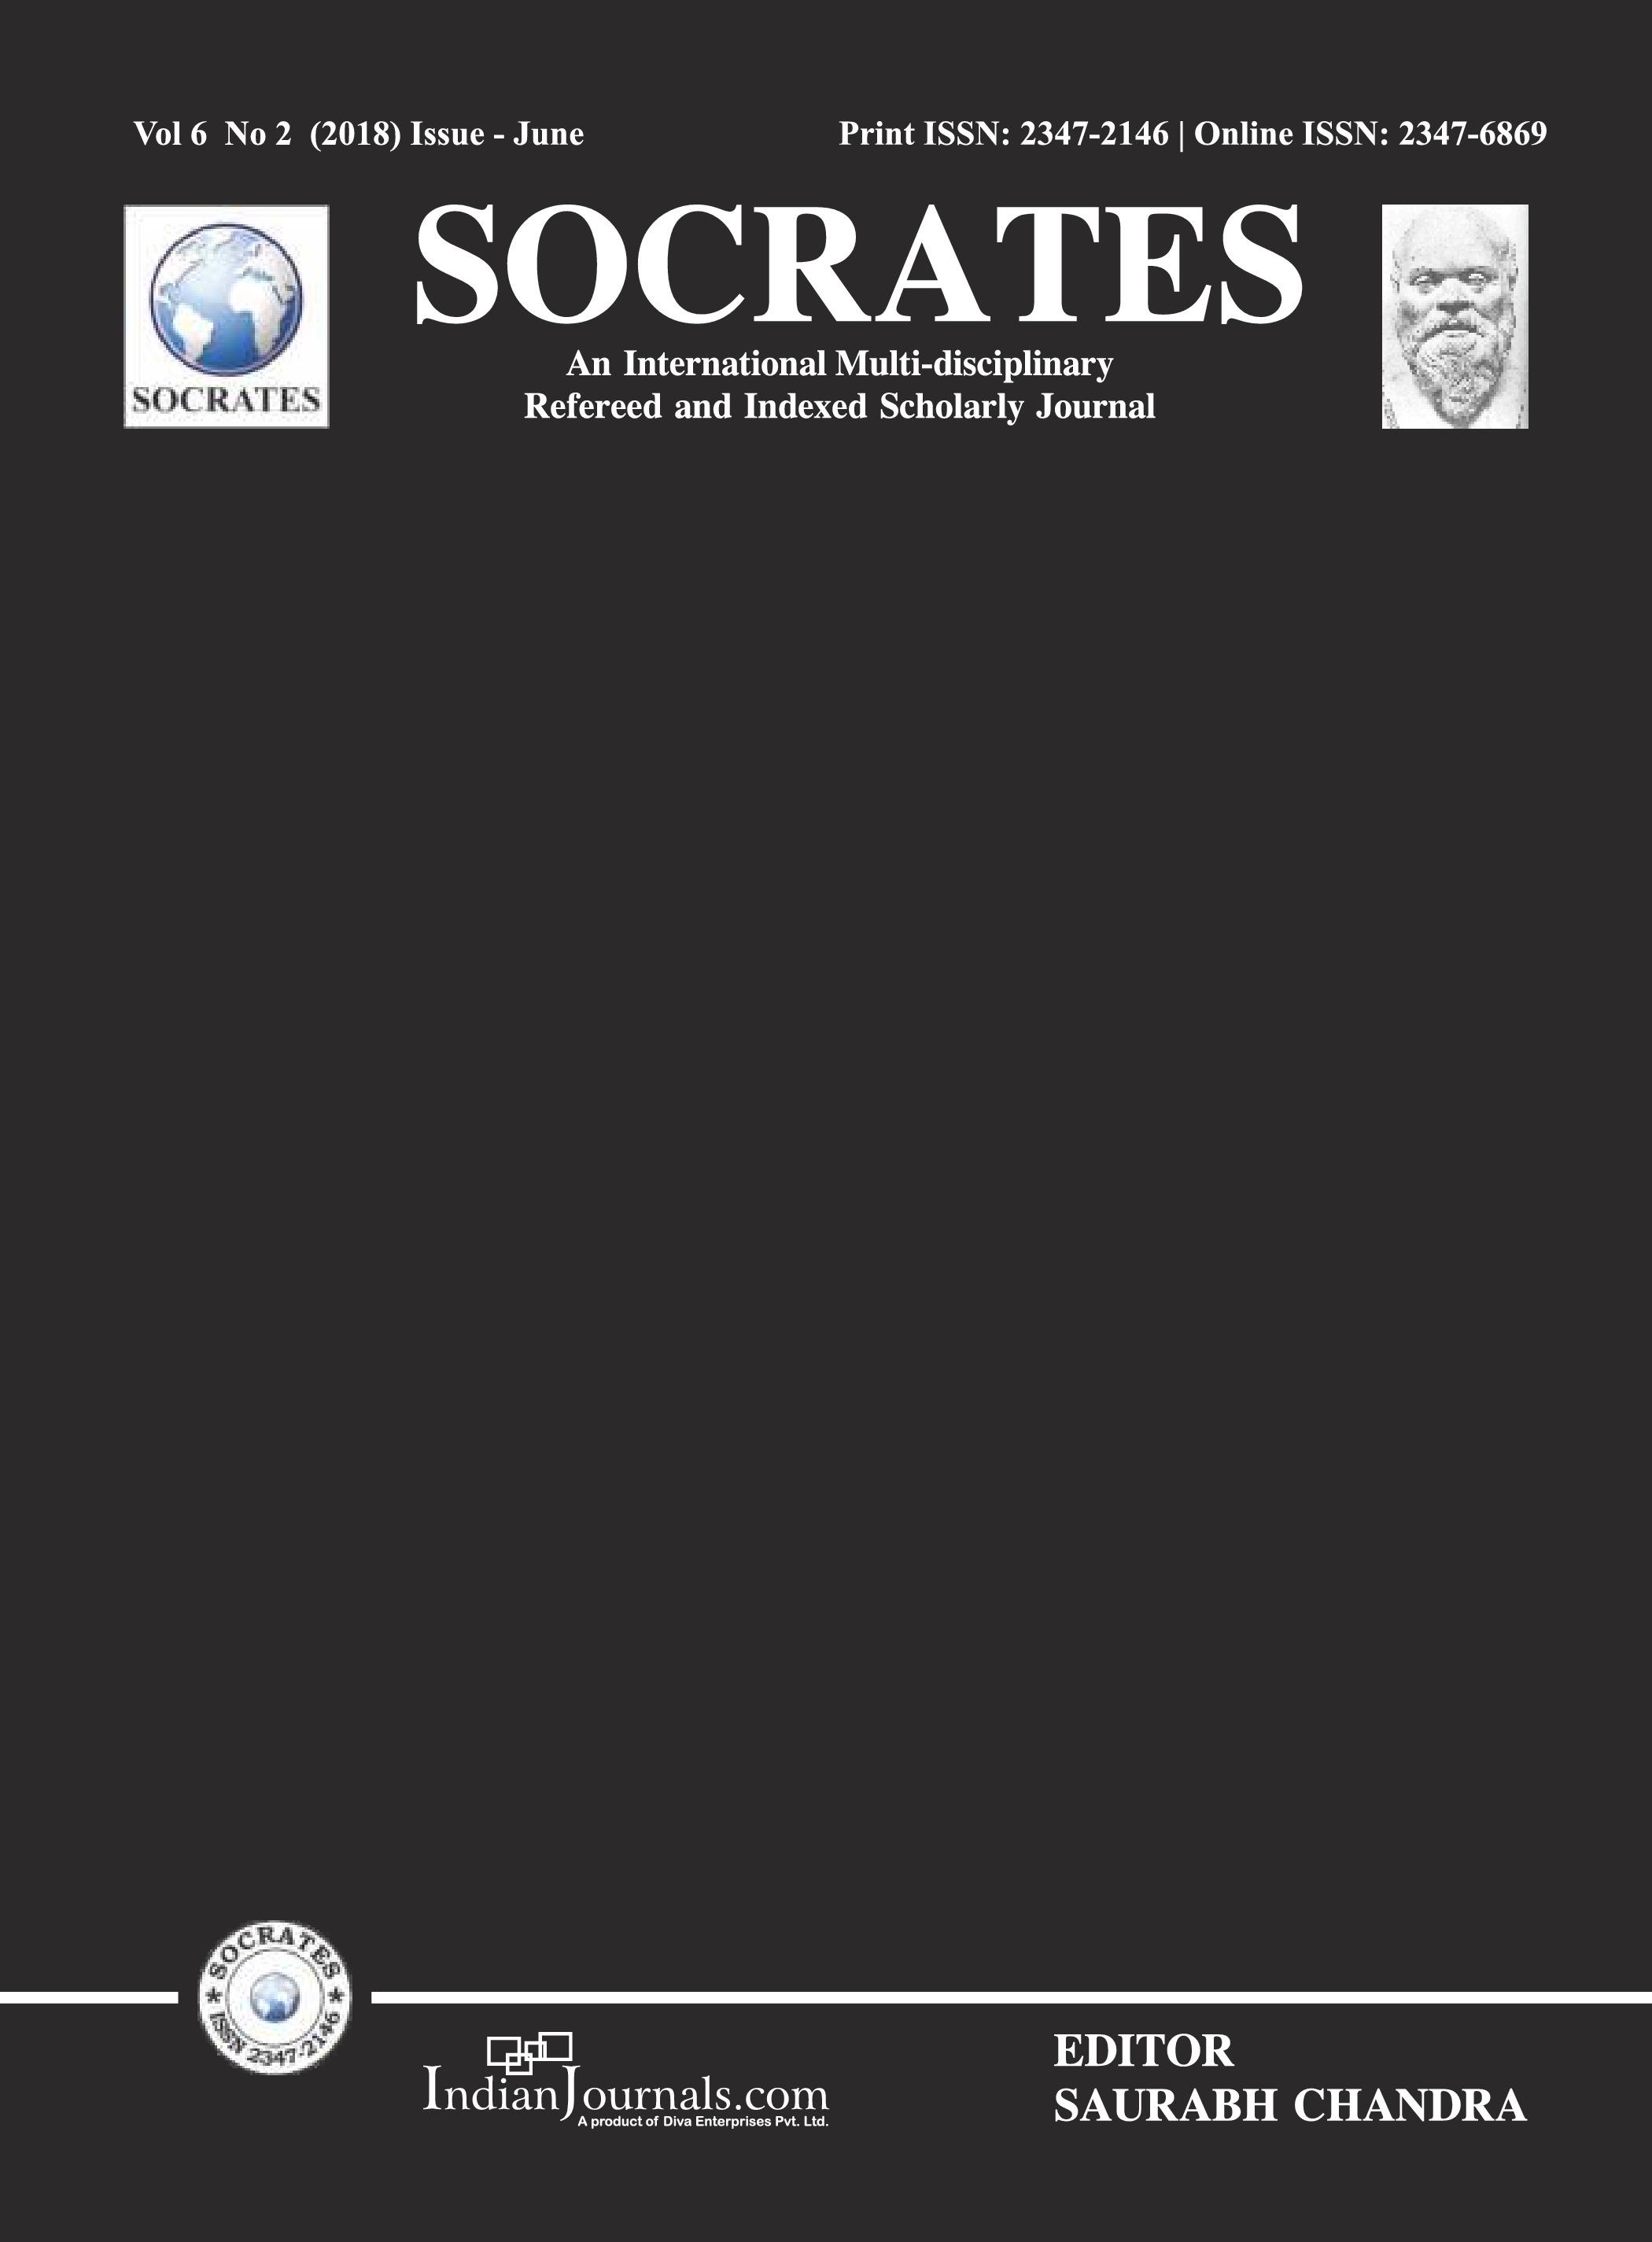 SOCRATES VOL 6 NO 2 (2018) ISSUE JUNE COVER